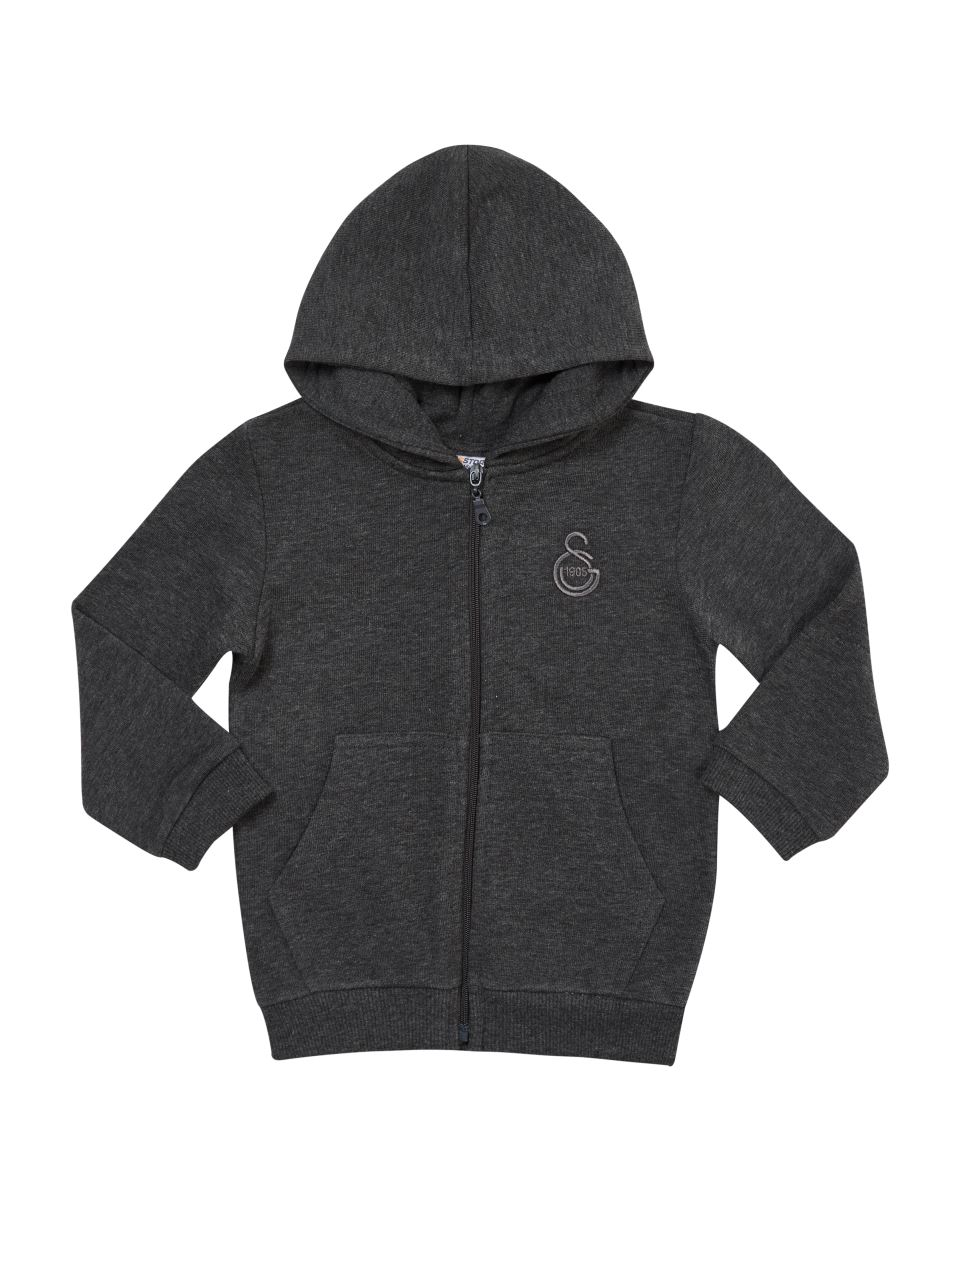 B77007 Fermuarlı Sweatshirt